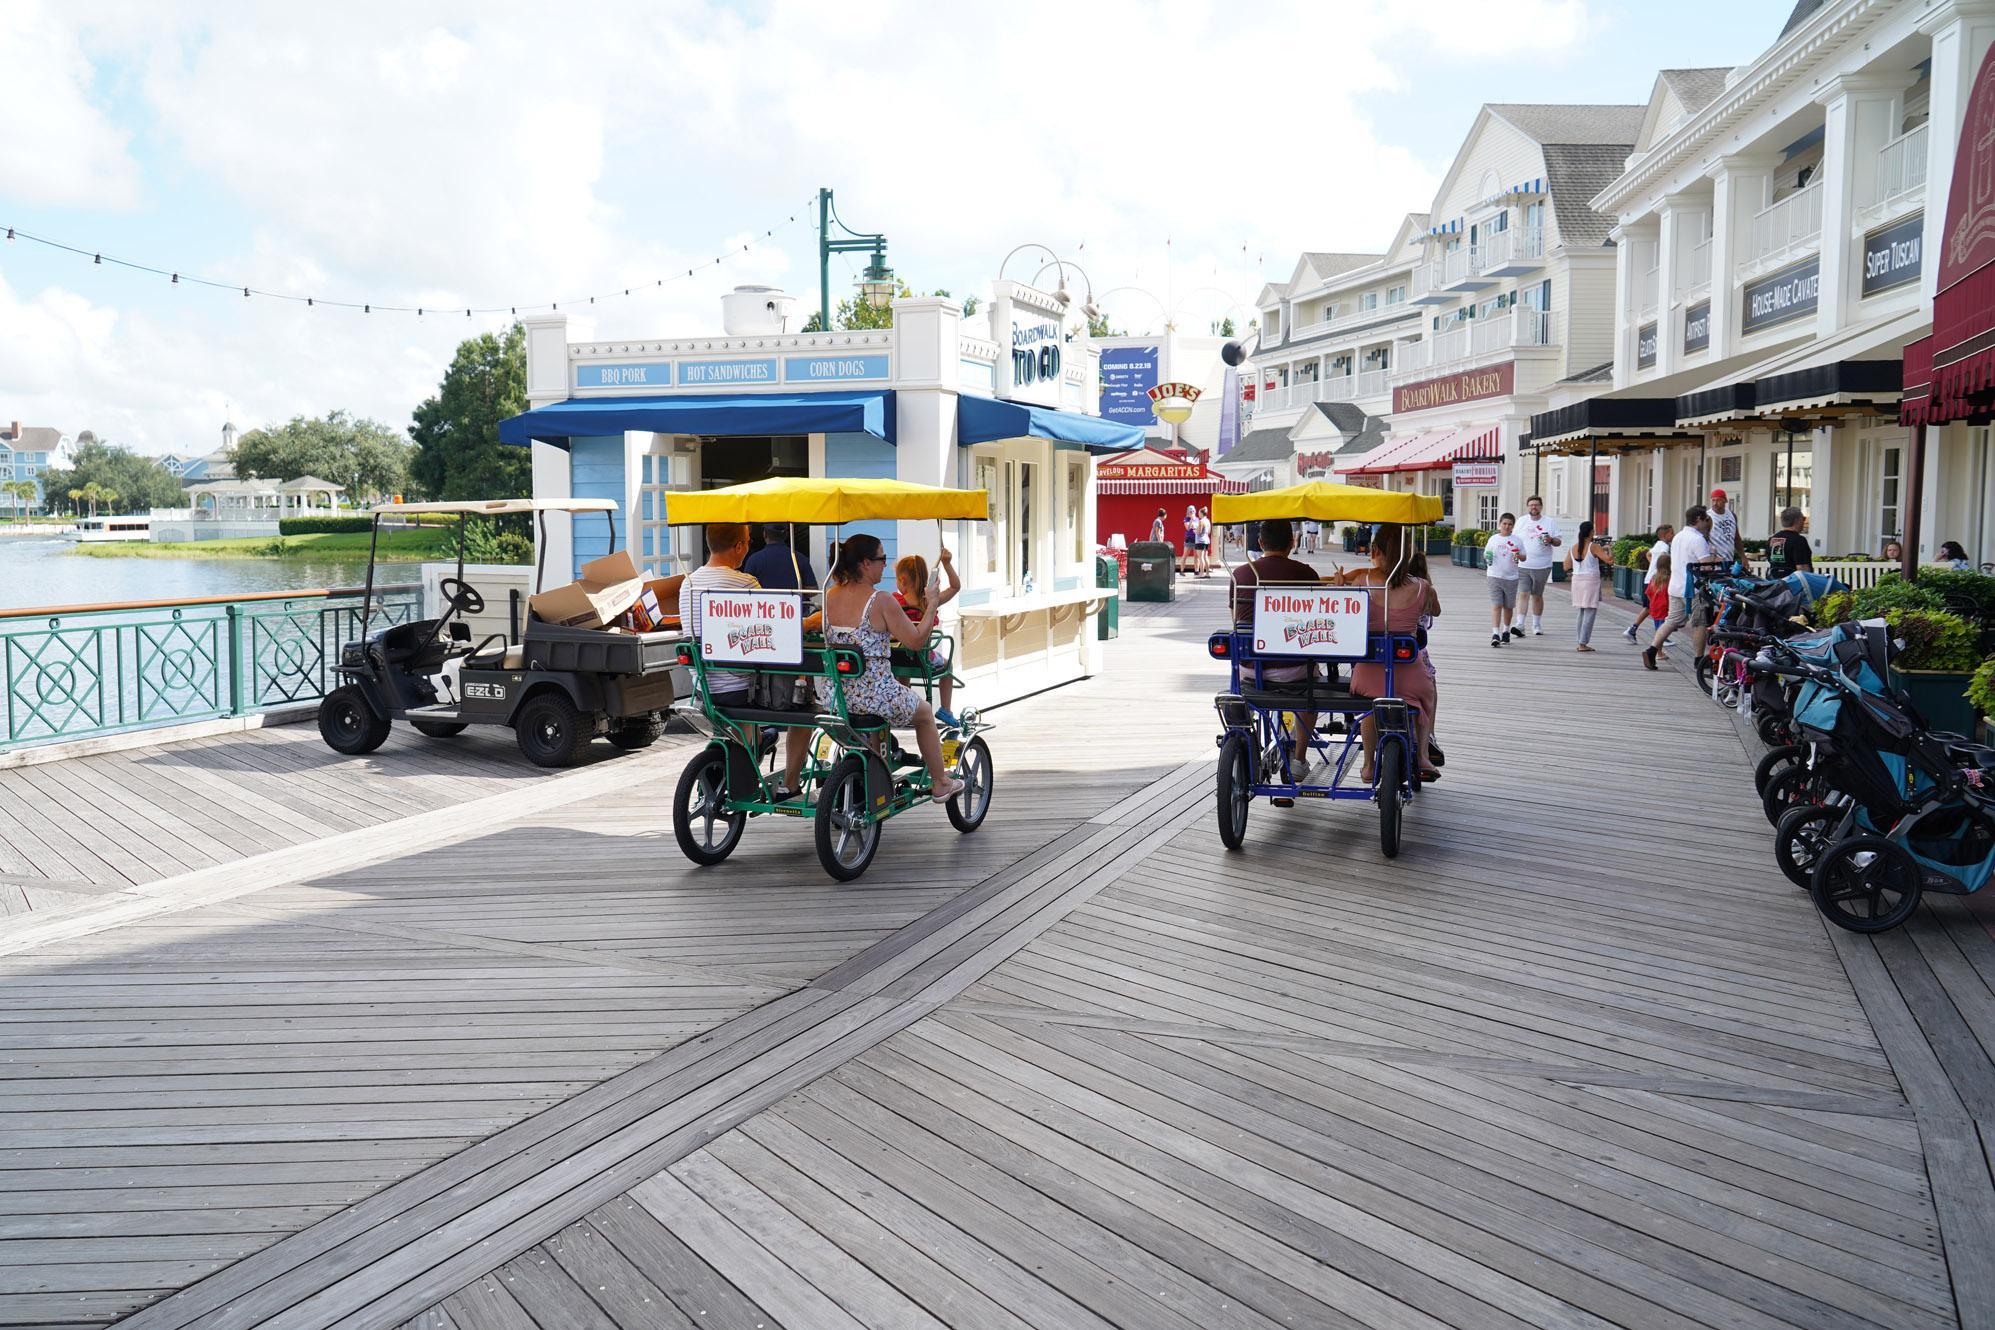 Disney Deluxe Resorts